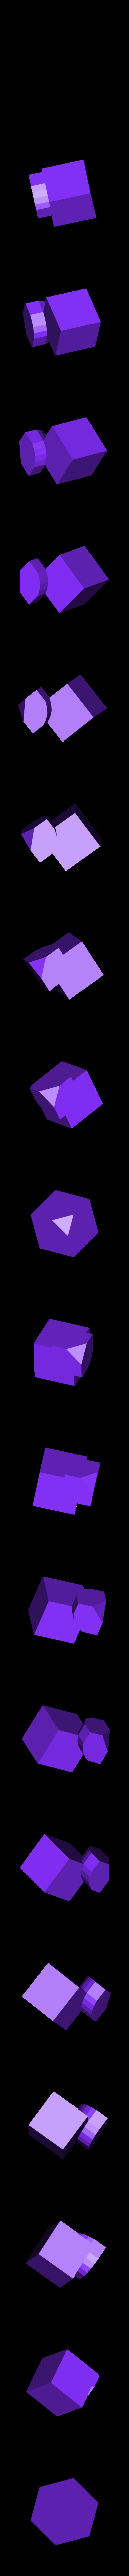 corner_v2_scaled.stl Télécharger fichier STL gratuit Rubik's Magic Cube • Design à imprimer en 3D, Jimmydelgadinho45